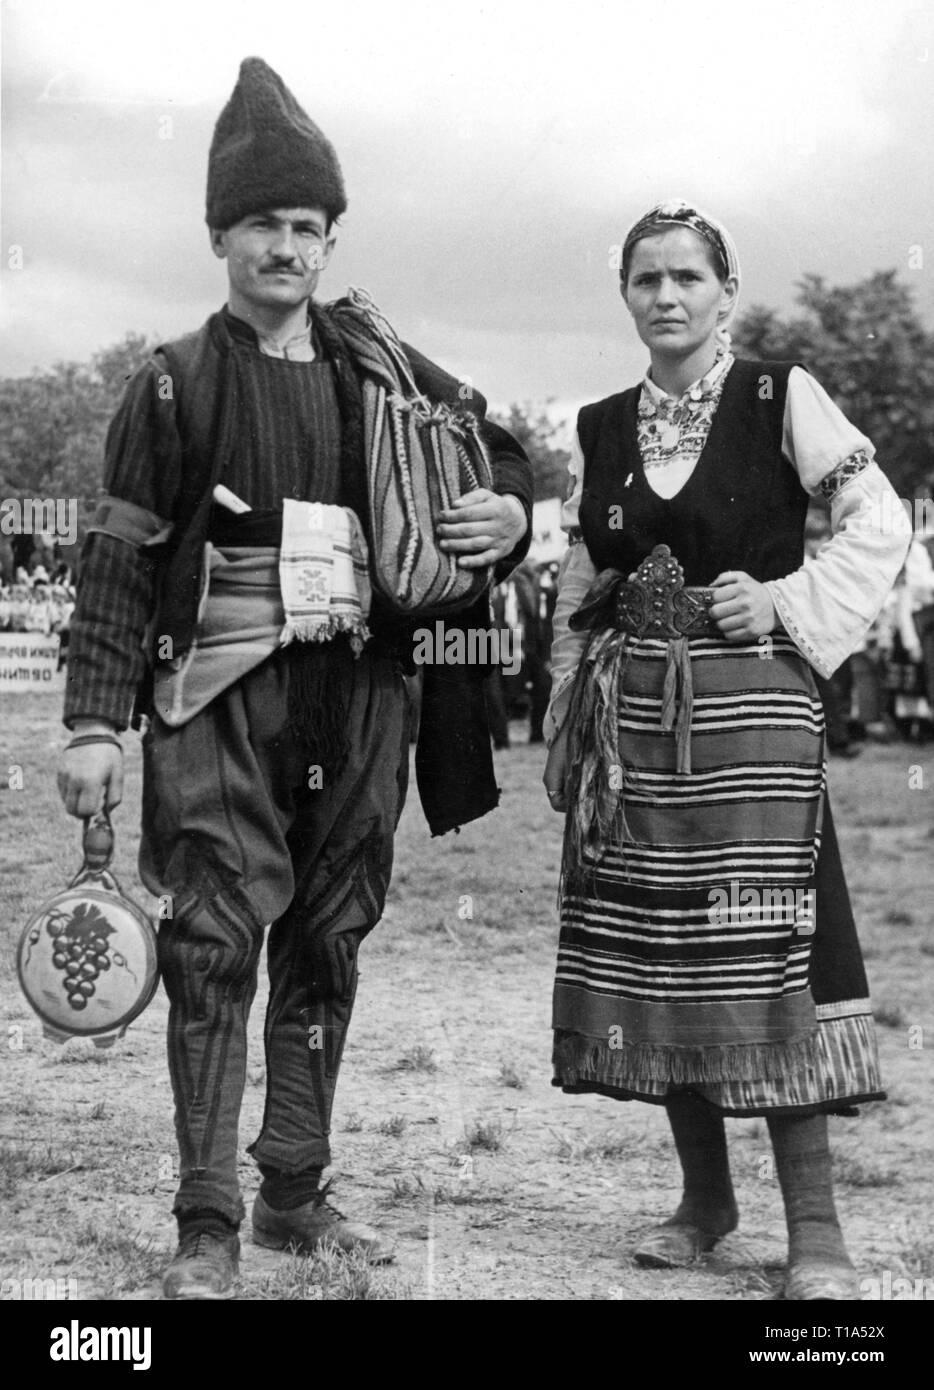 Geographie/Reisen historische, Bulgarien, Folklore, Bulgarische Ehepaar in Tracht, circa 1935, Additional-Rights - Clearance-Info - Not-Available Stockbild